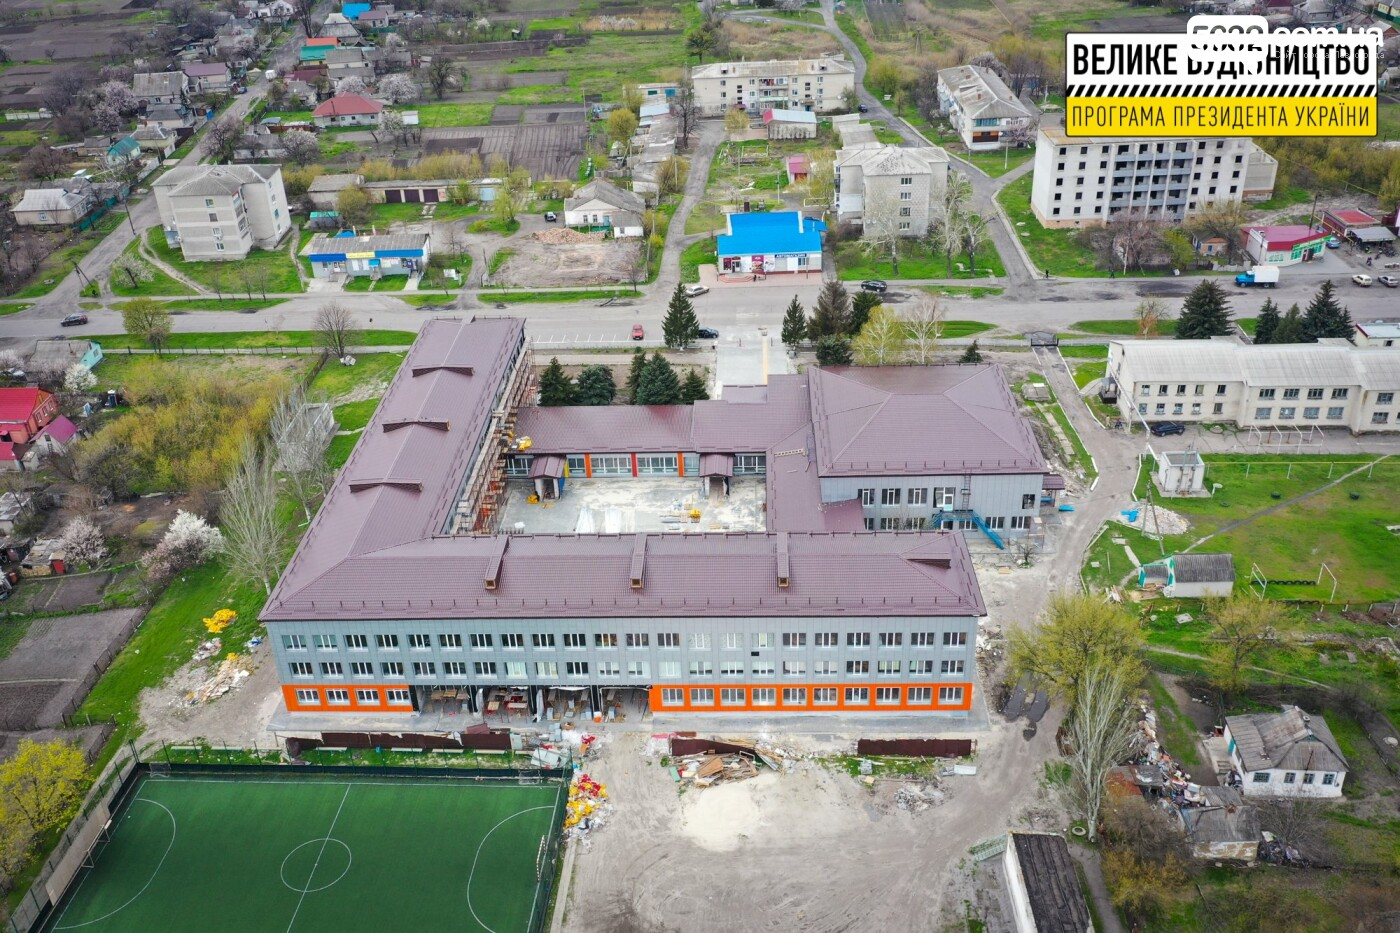 В Петропавловке модернизируют опорную школу (ФОТОРЕПОРТАЖ), фото-1